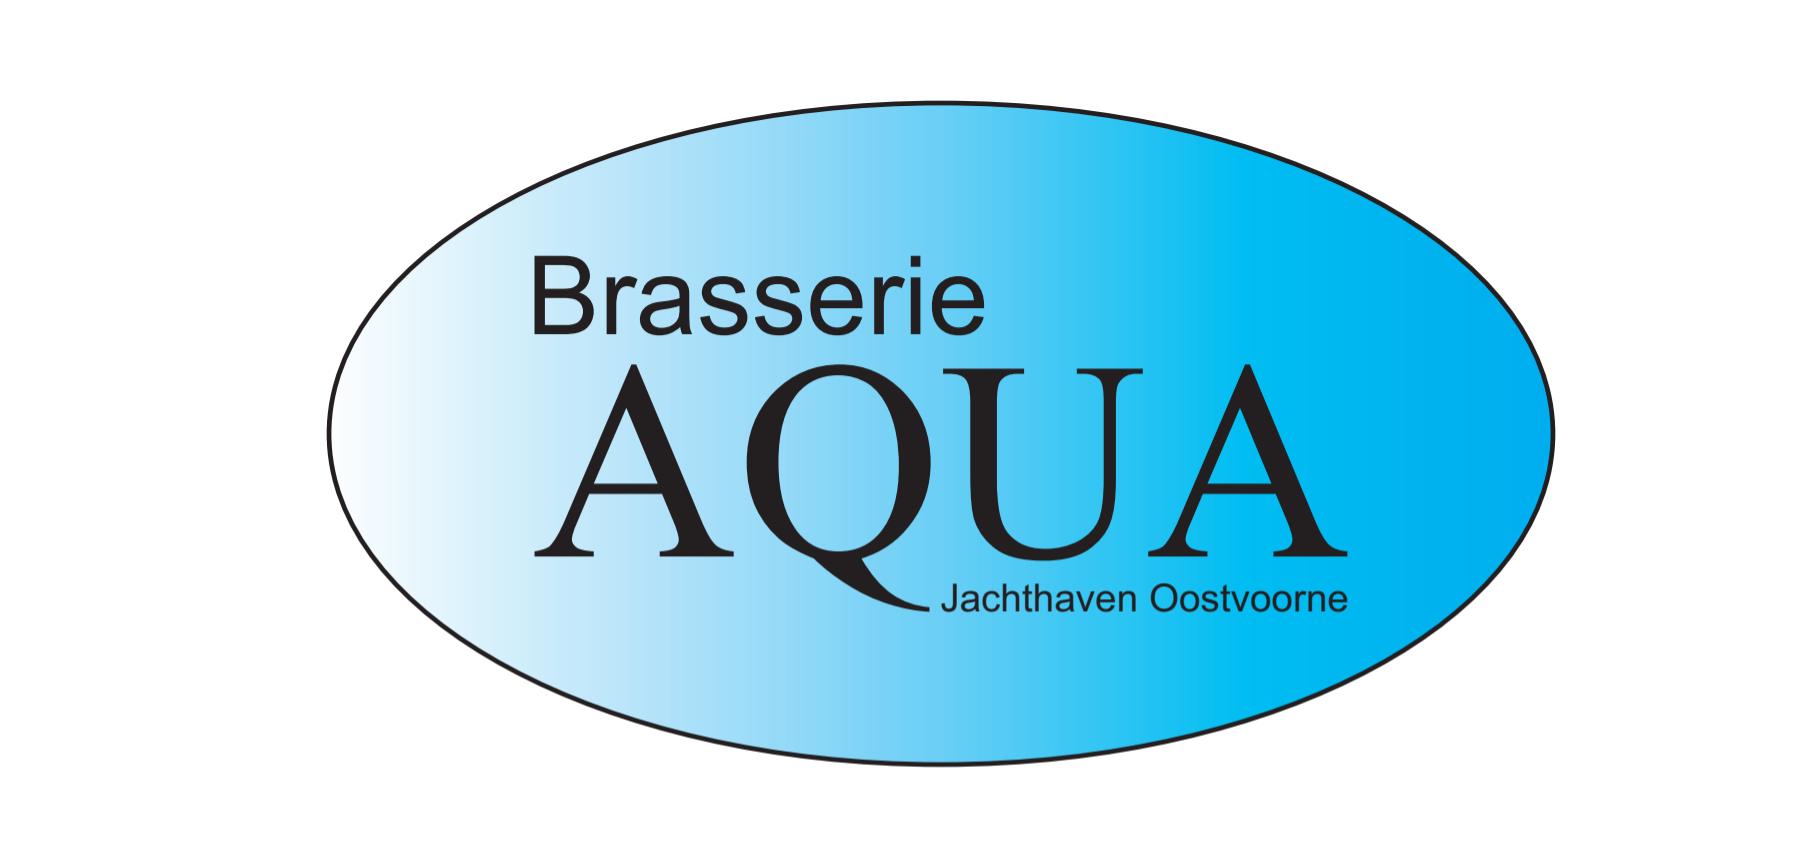 website-aqauCB61B213-42DC-5C99-529B-69E1F834F557.png